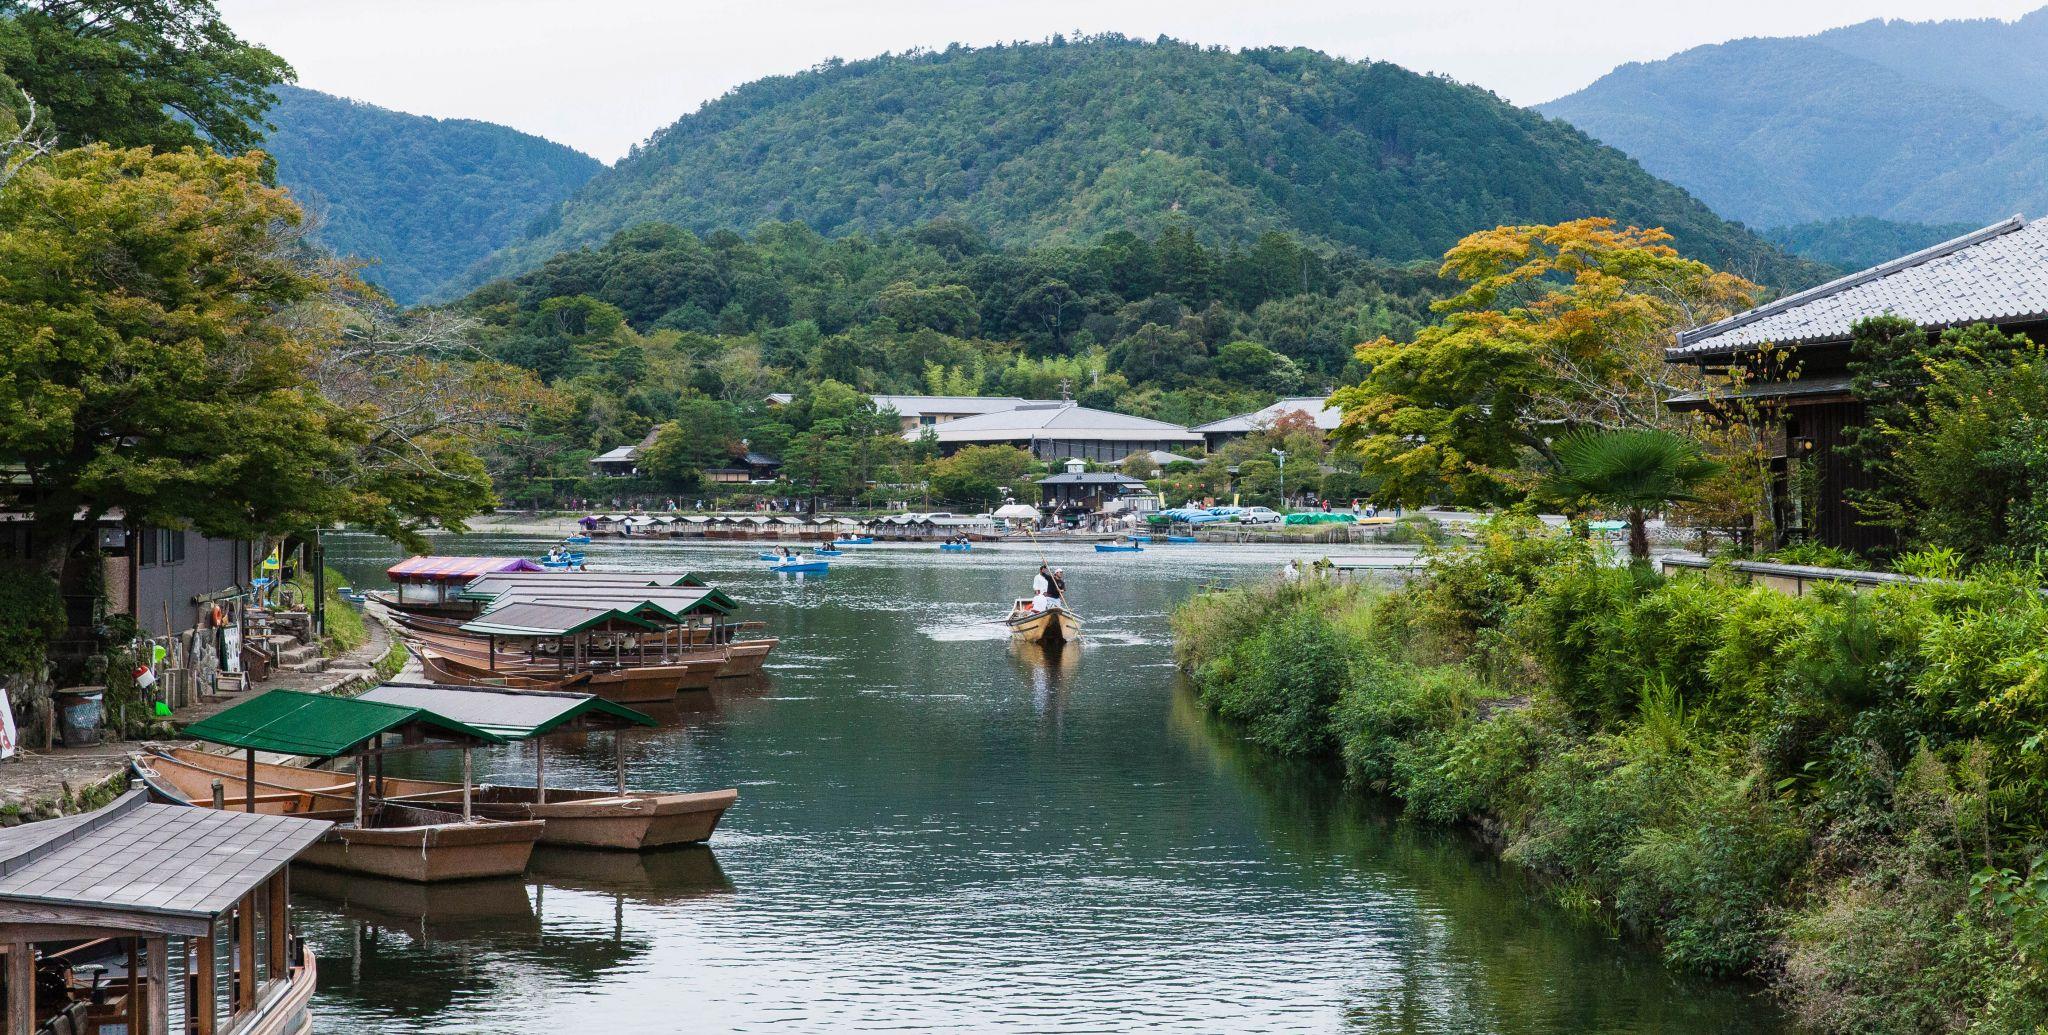 Katsura River, Japan